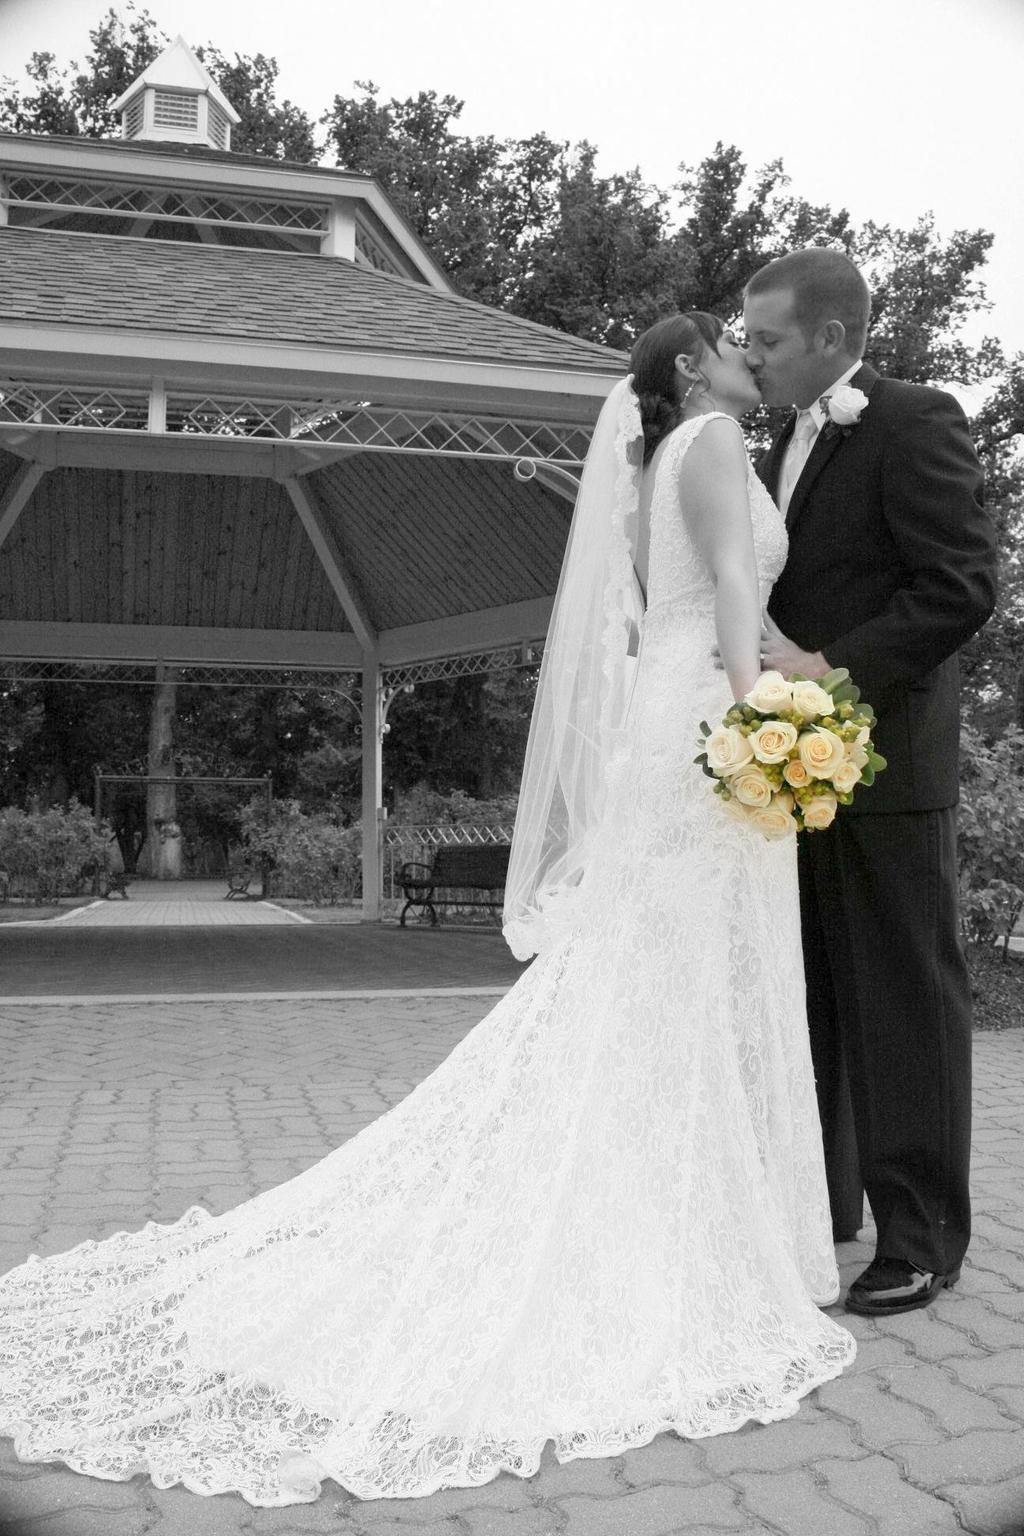 Seabold_wedding_09_20401.original.full